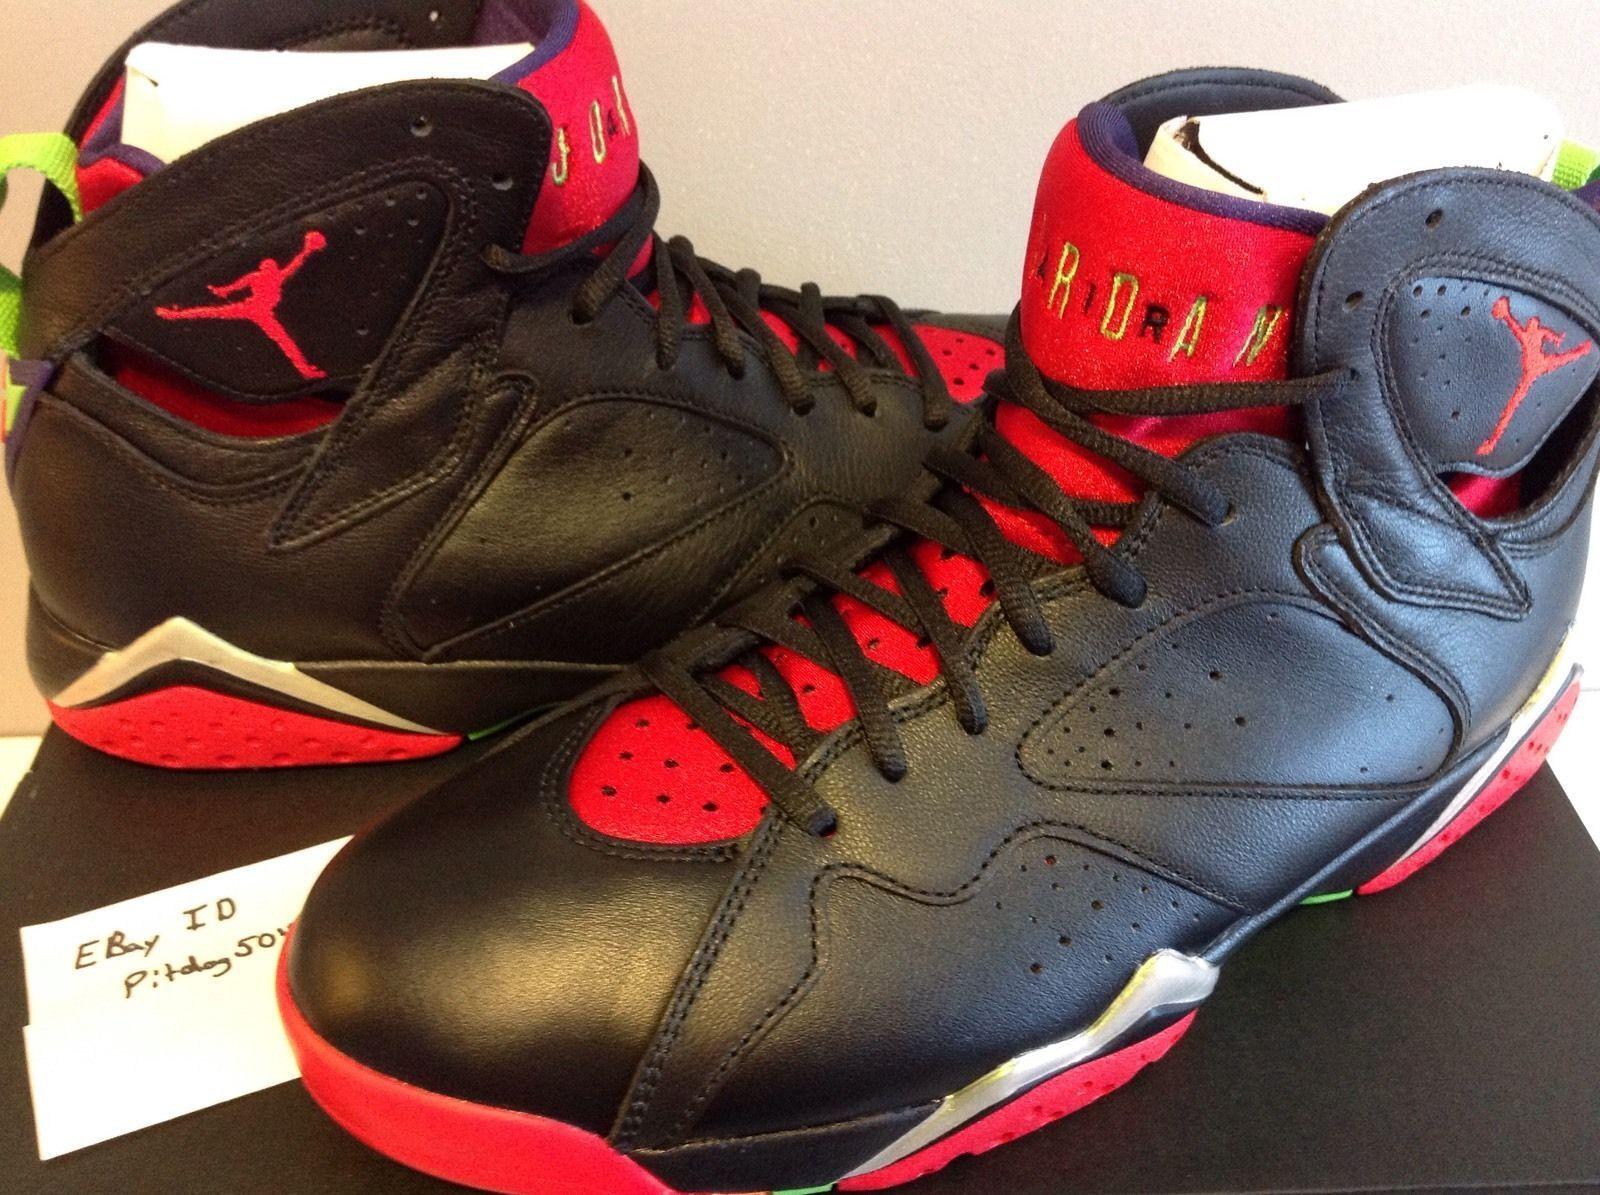 Nike Air Jordan VII Retro 7 Marvin Martian Black Red 9.5 with receipt 304775-029